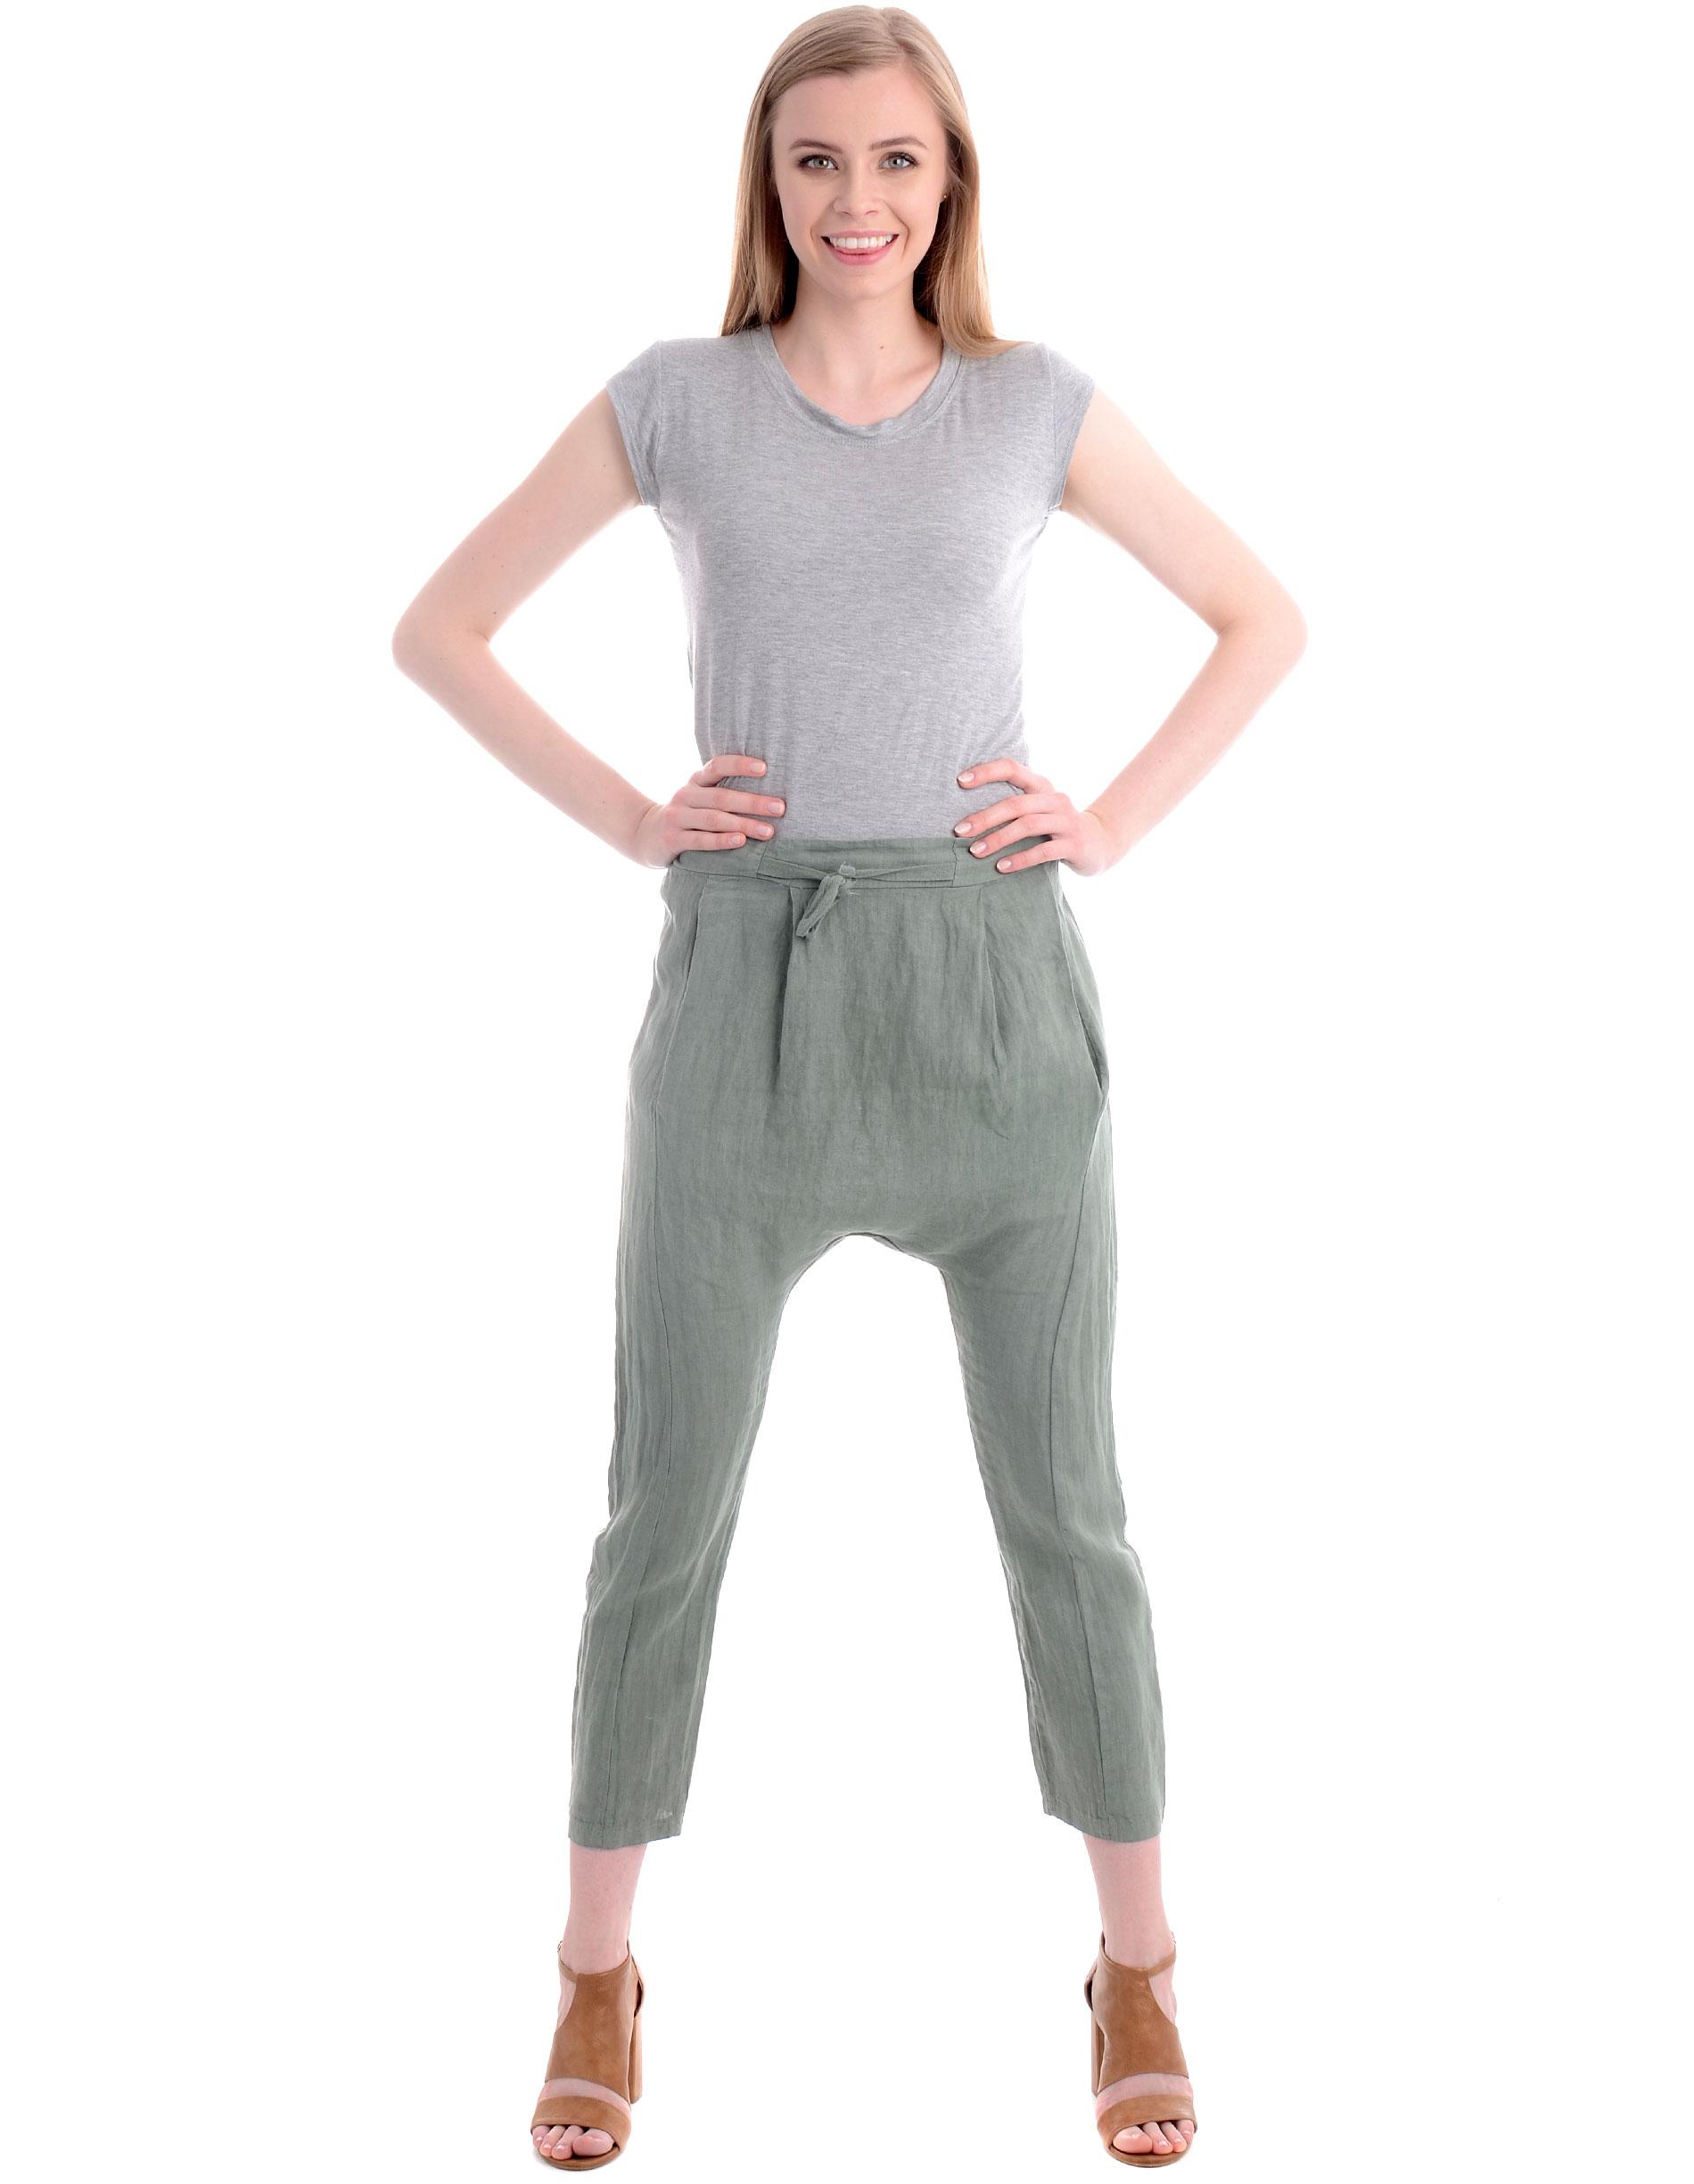 Spodnie - 108-8115 MILI - Unisono